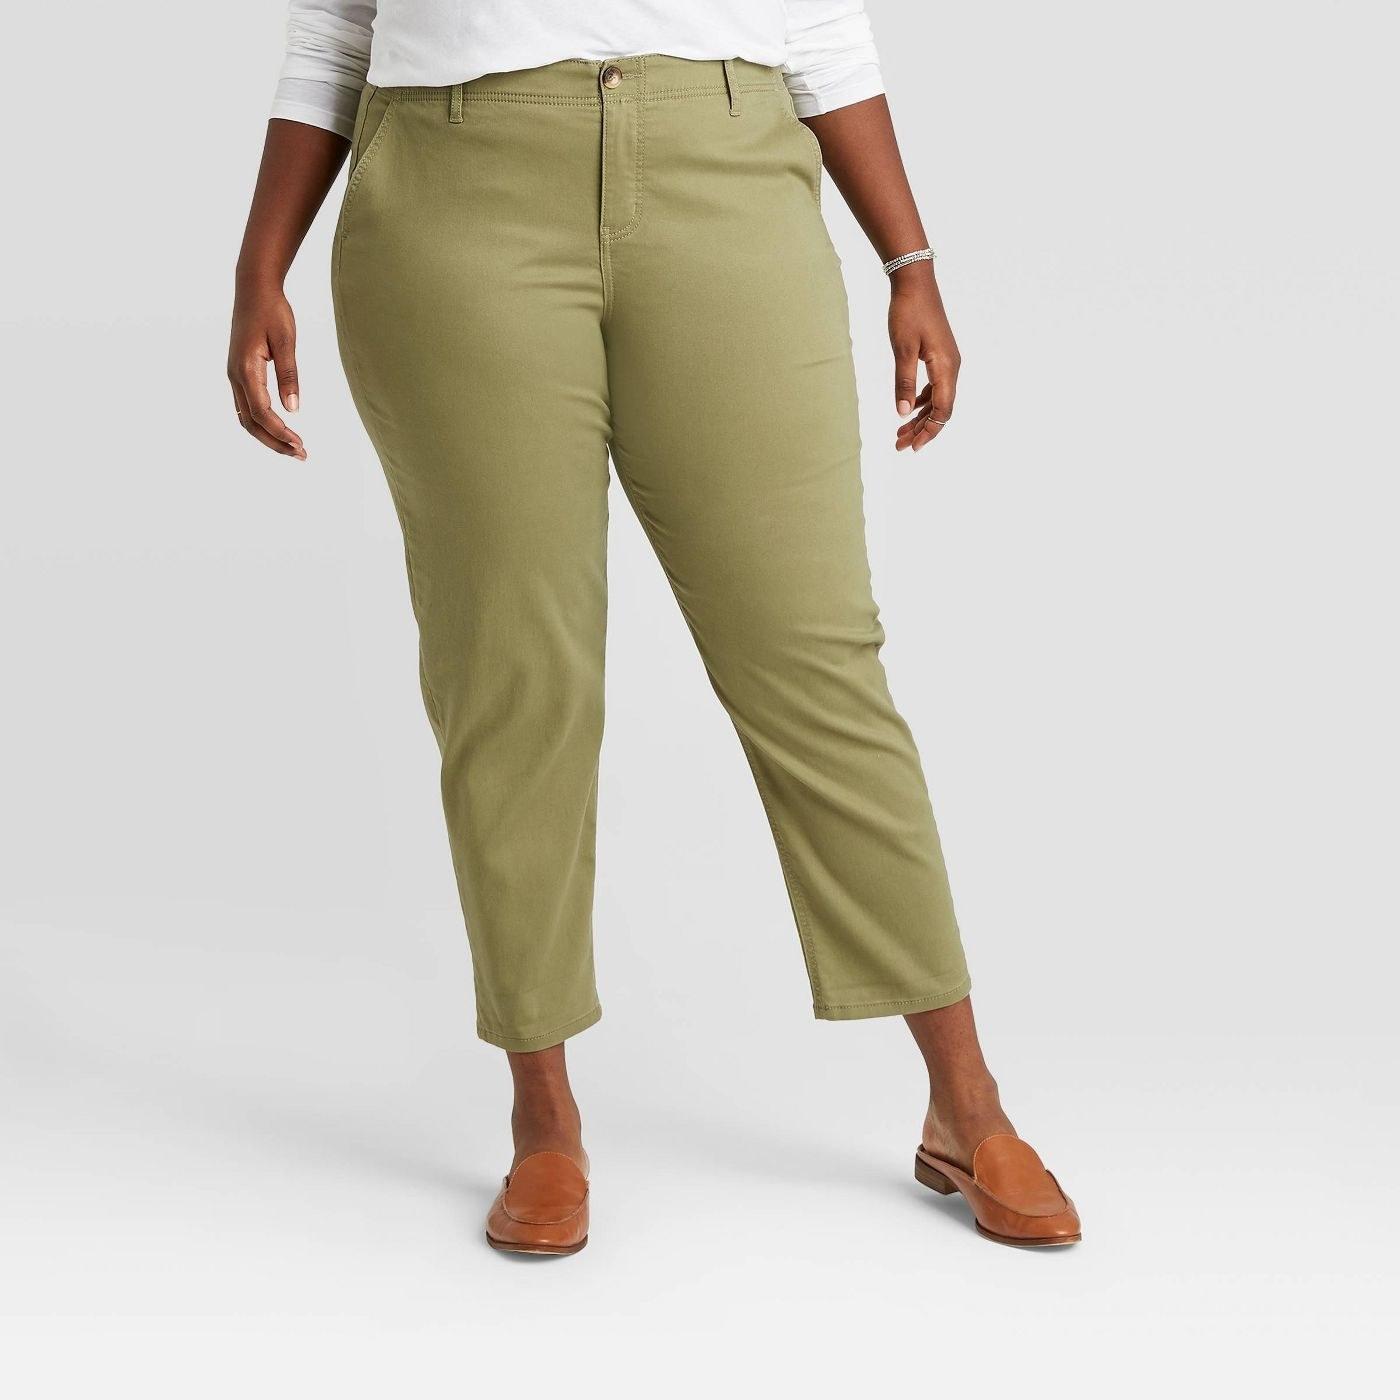 Model wearing olive green pants